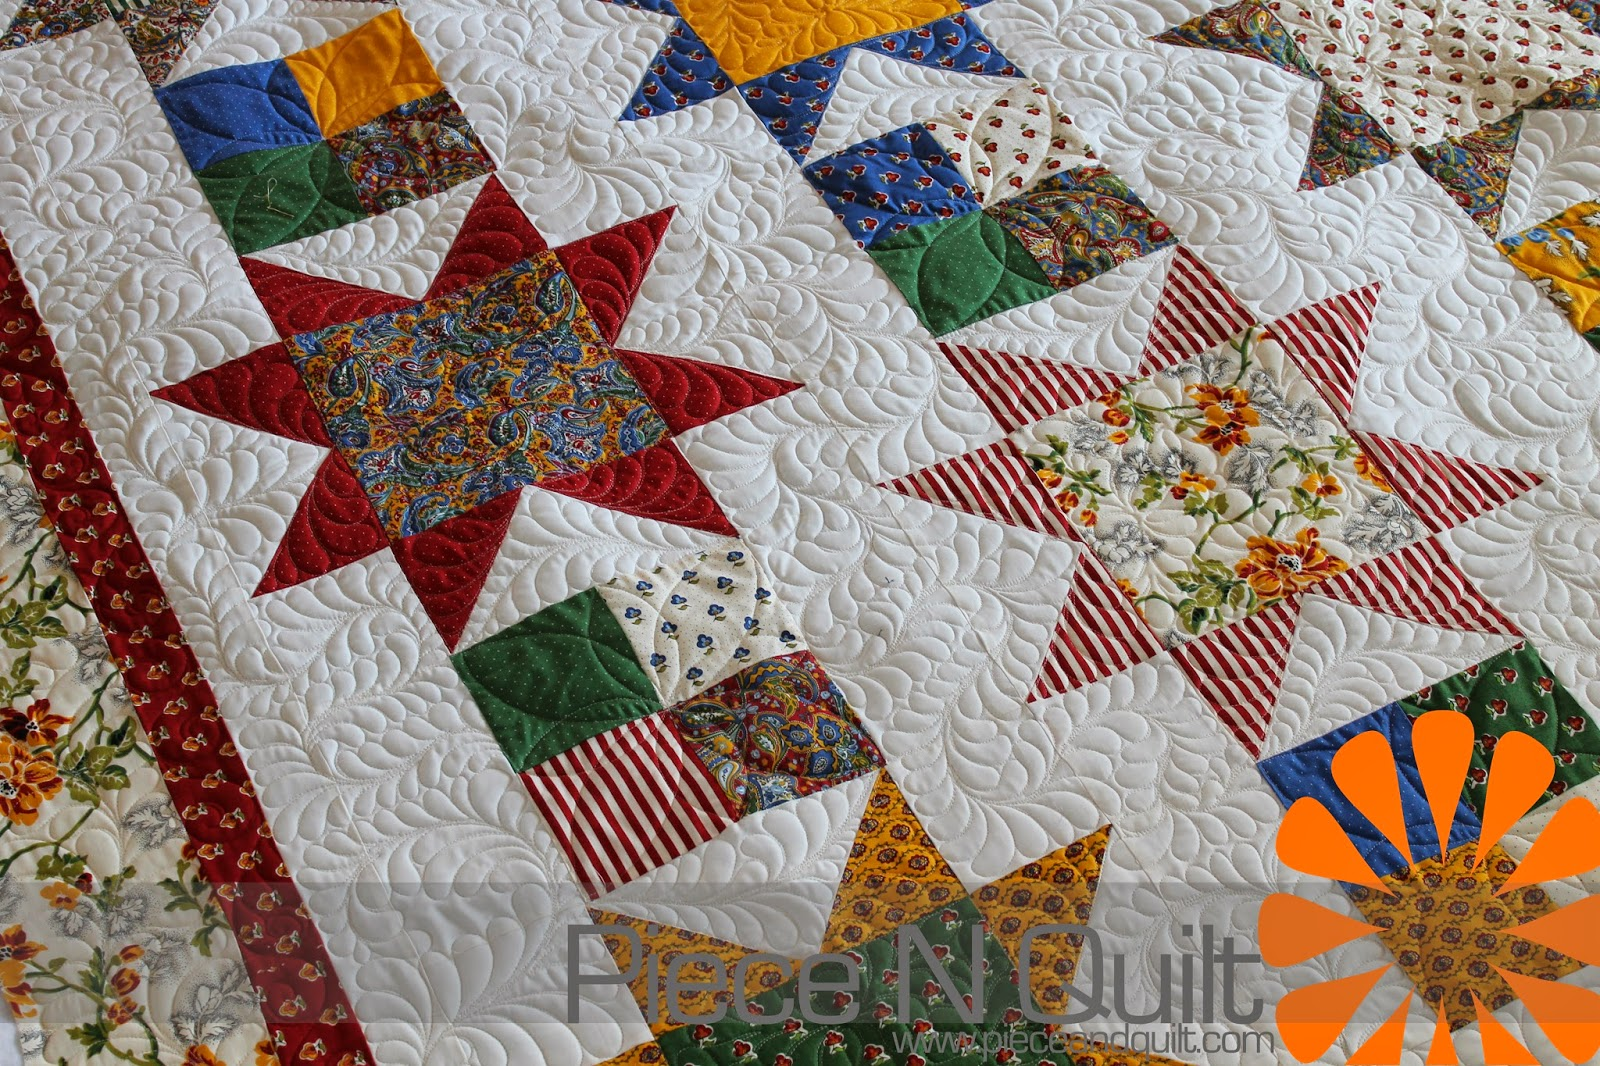 Piece N Quilt: Sawtooth Star Quilt